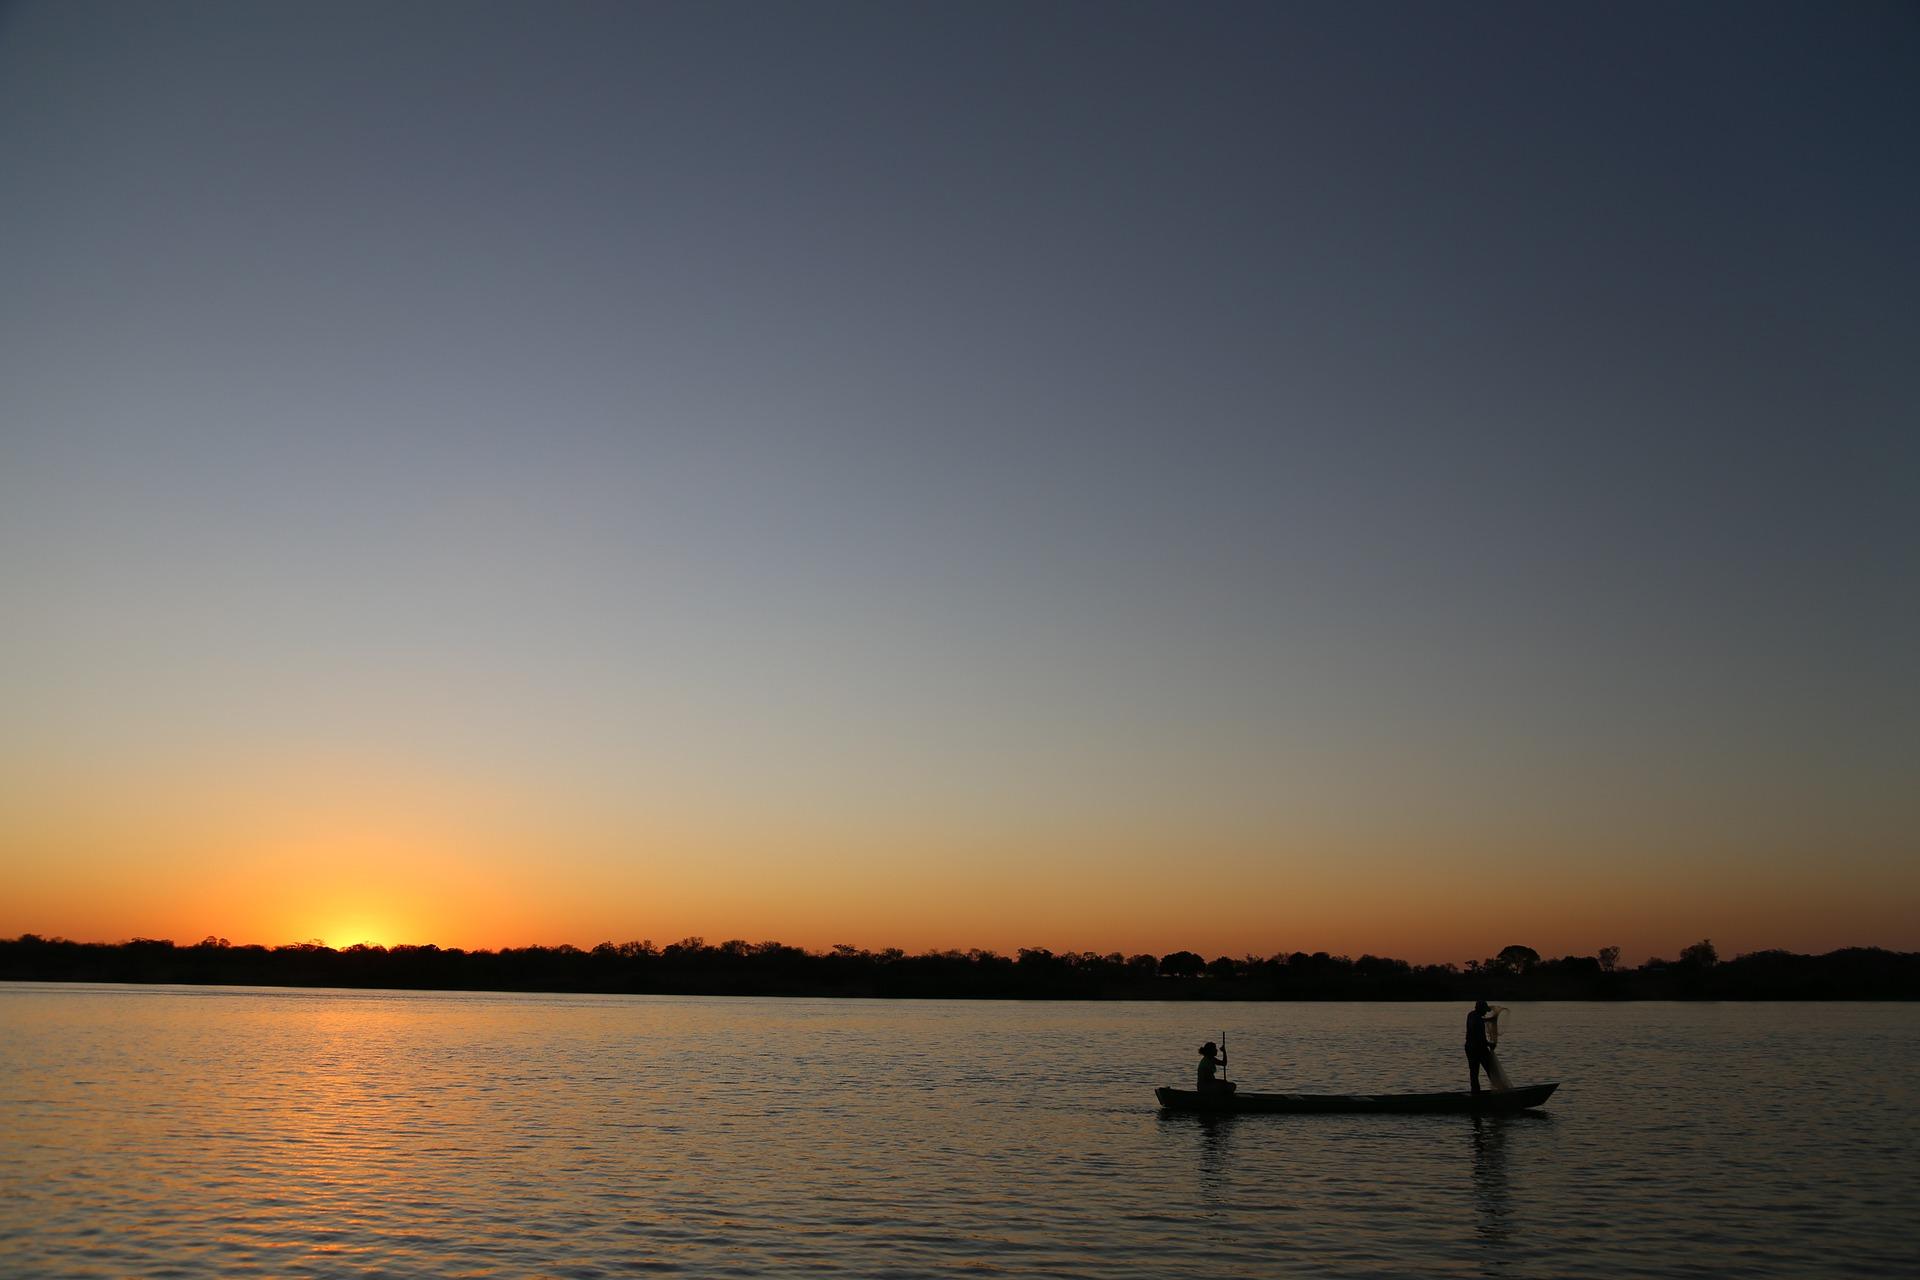 Sunset over catfish pond